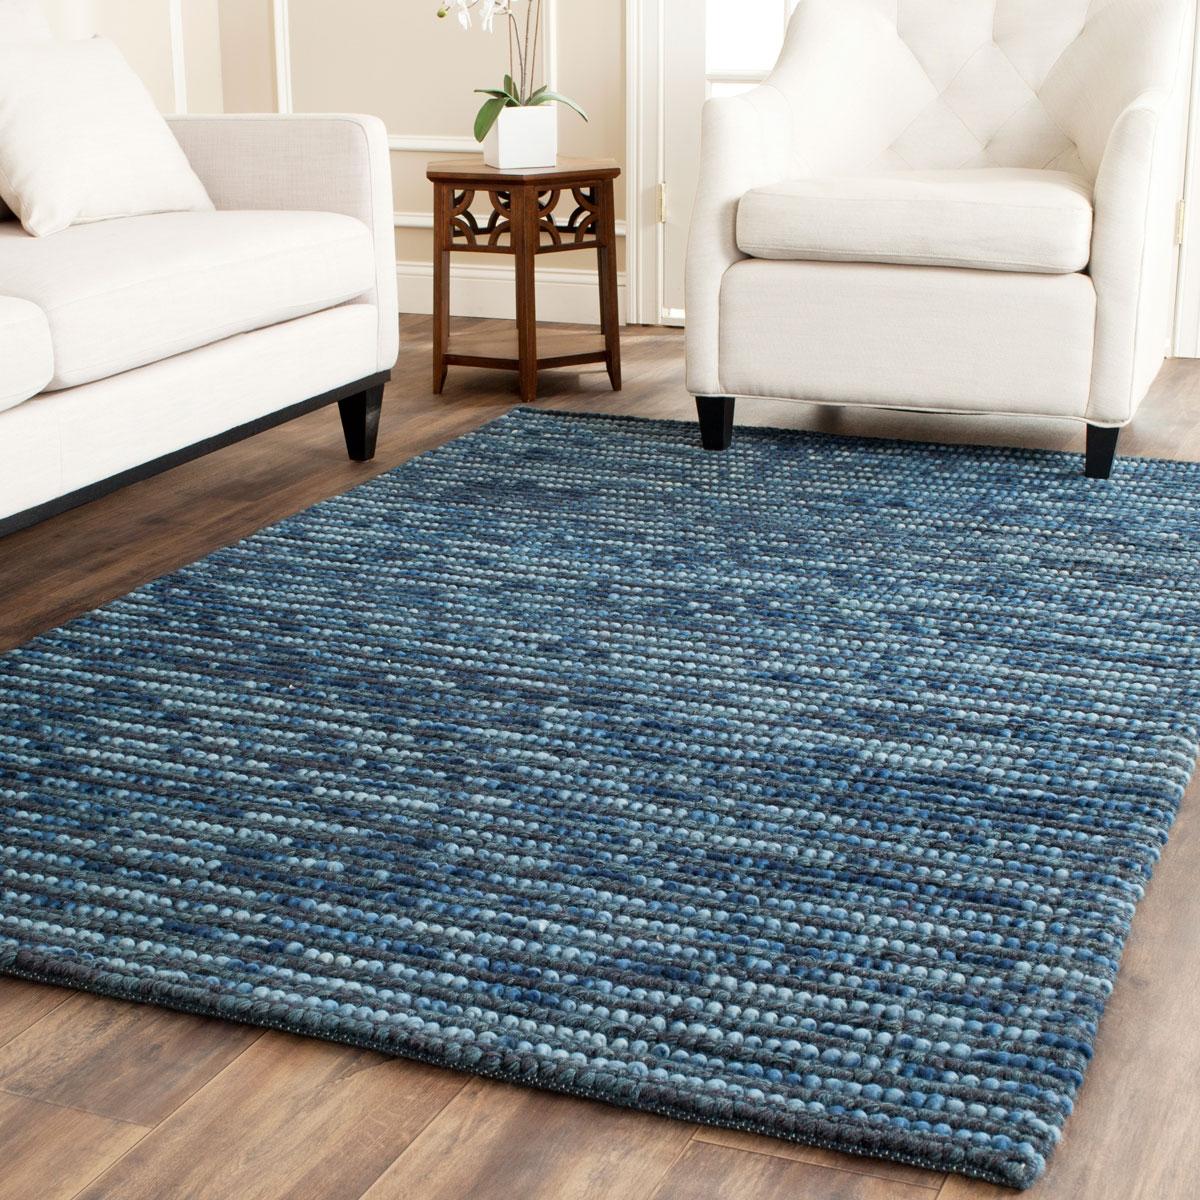 Rug Boh525g Bohemian Area Rugs Safavieh For Wool Jute Area Rugs (#7 of 15)